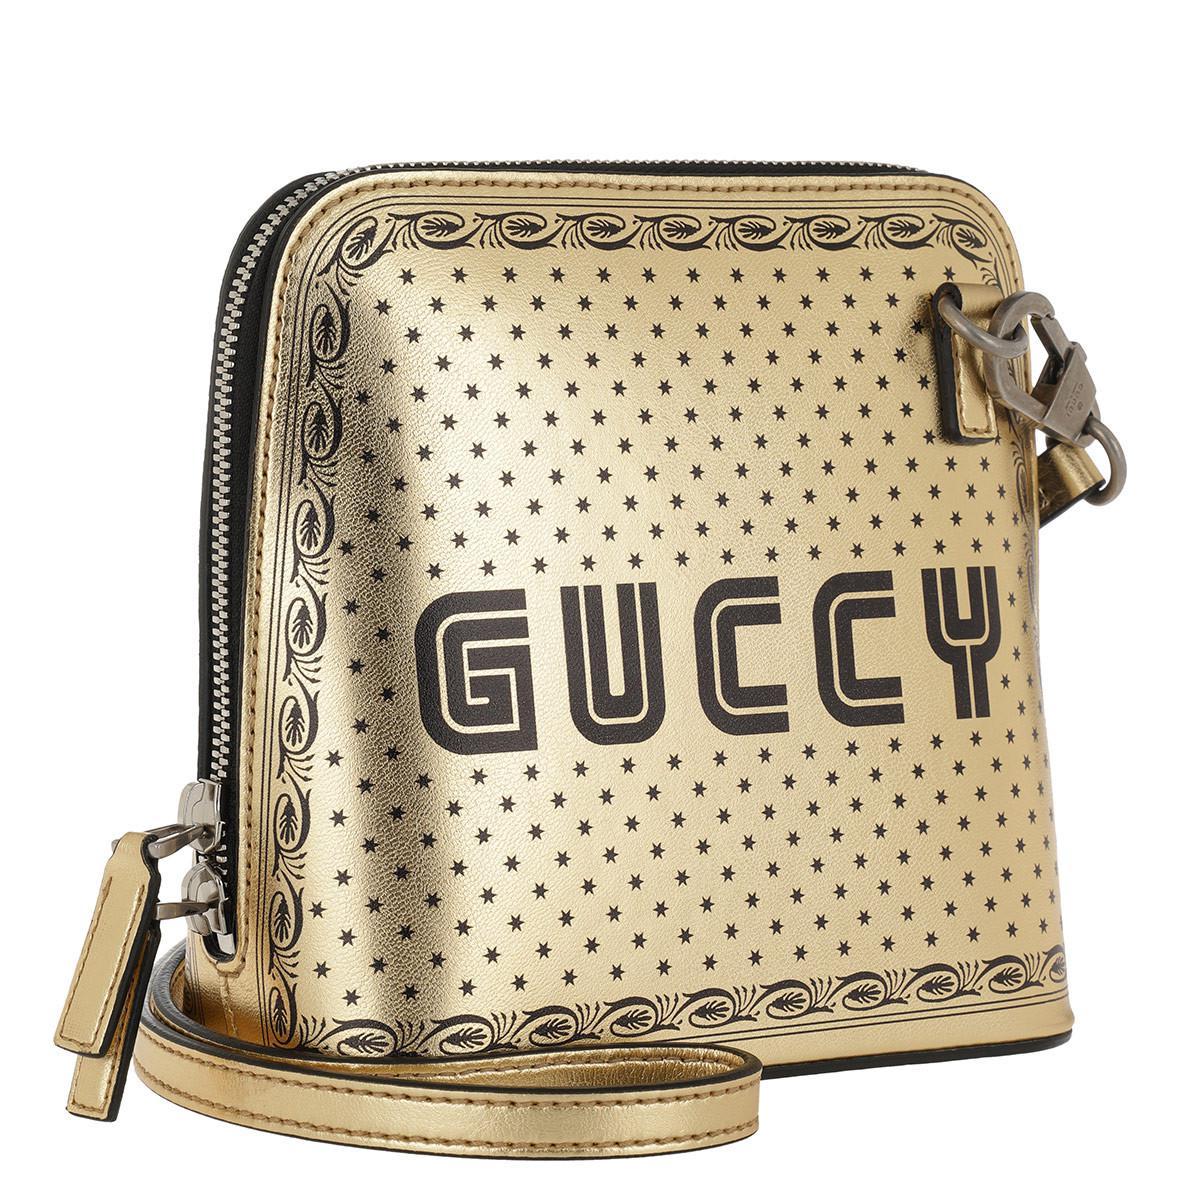 6d69467b2996 Gucci - Metallic Gold-tone Guccy Mini Leather Shoulder Bag - Lyst. View  fullscreen